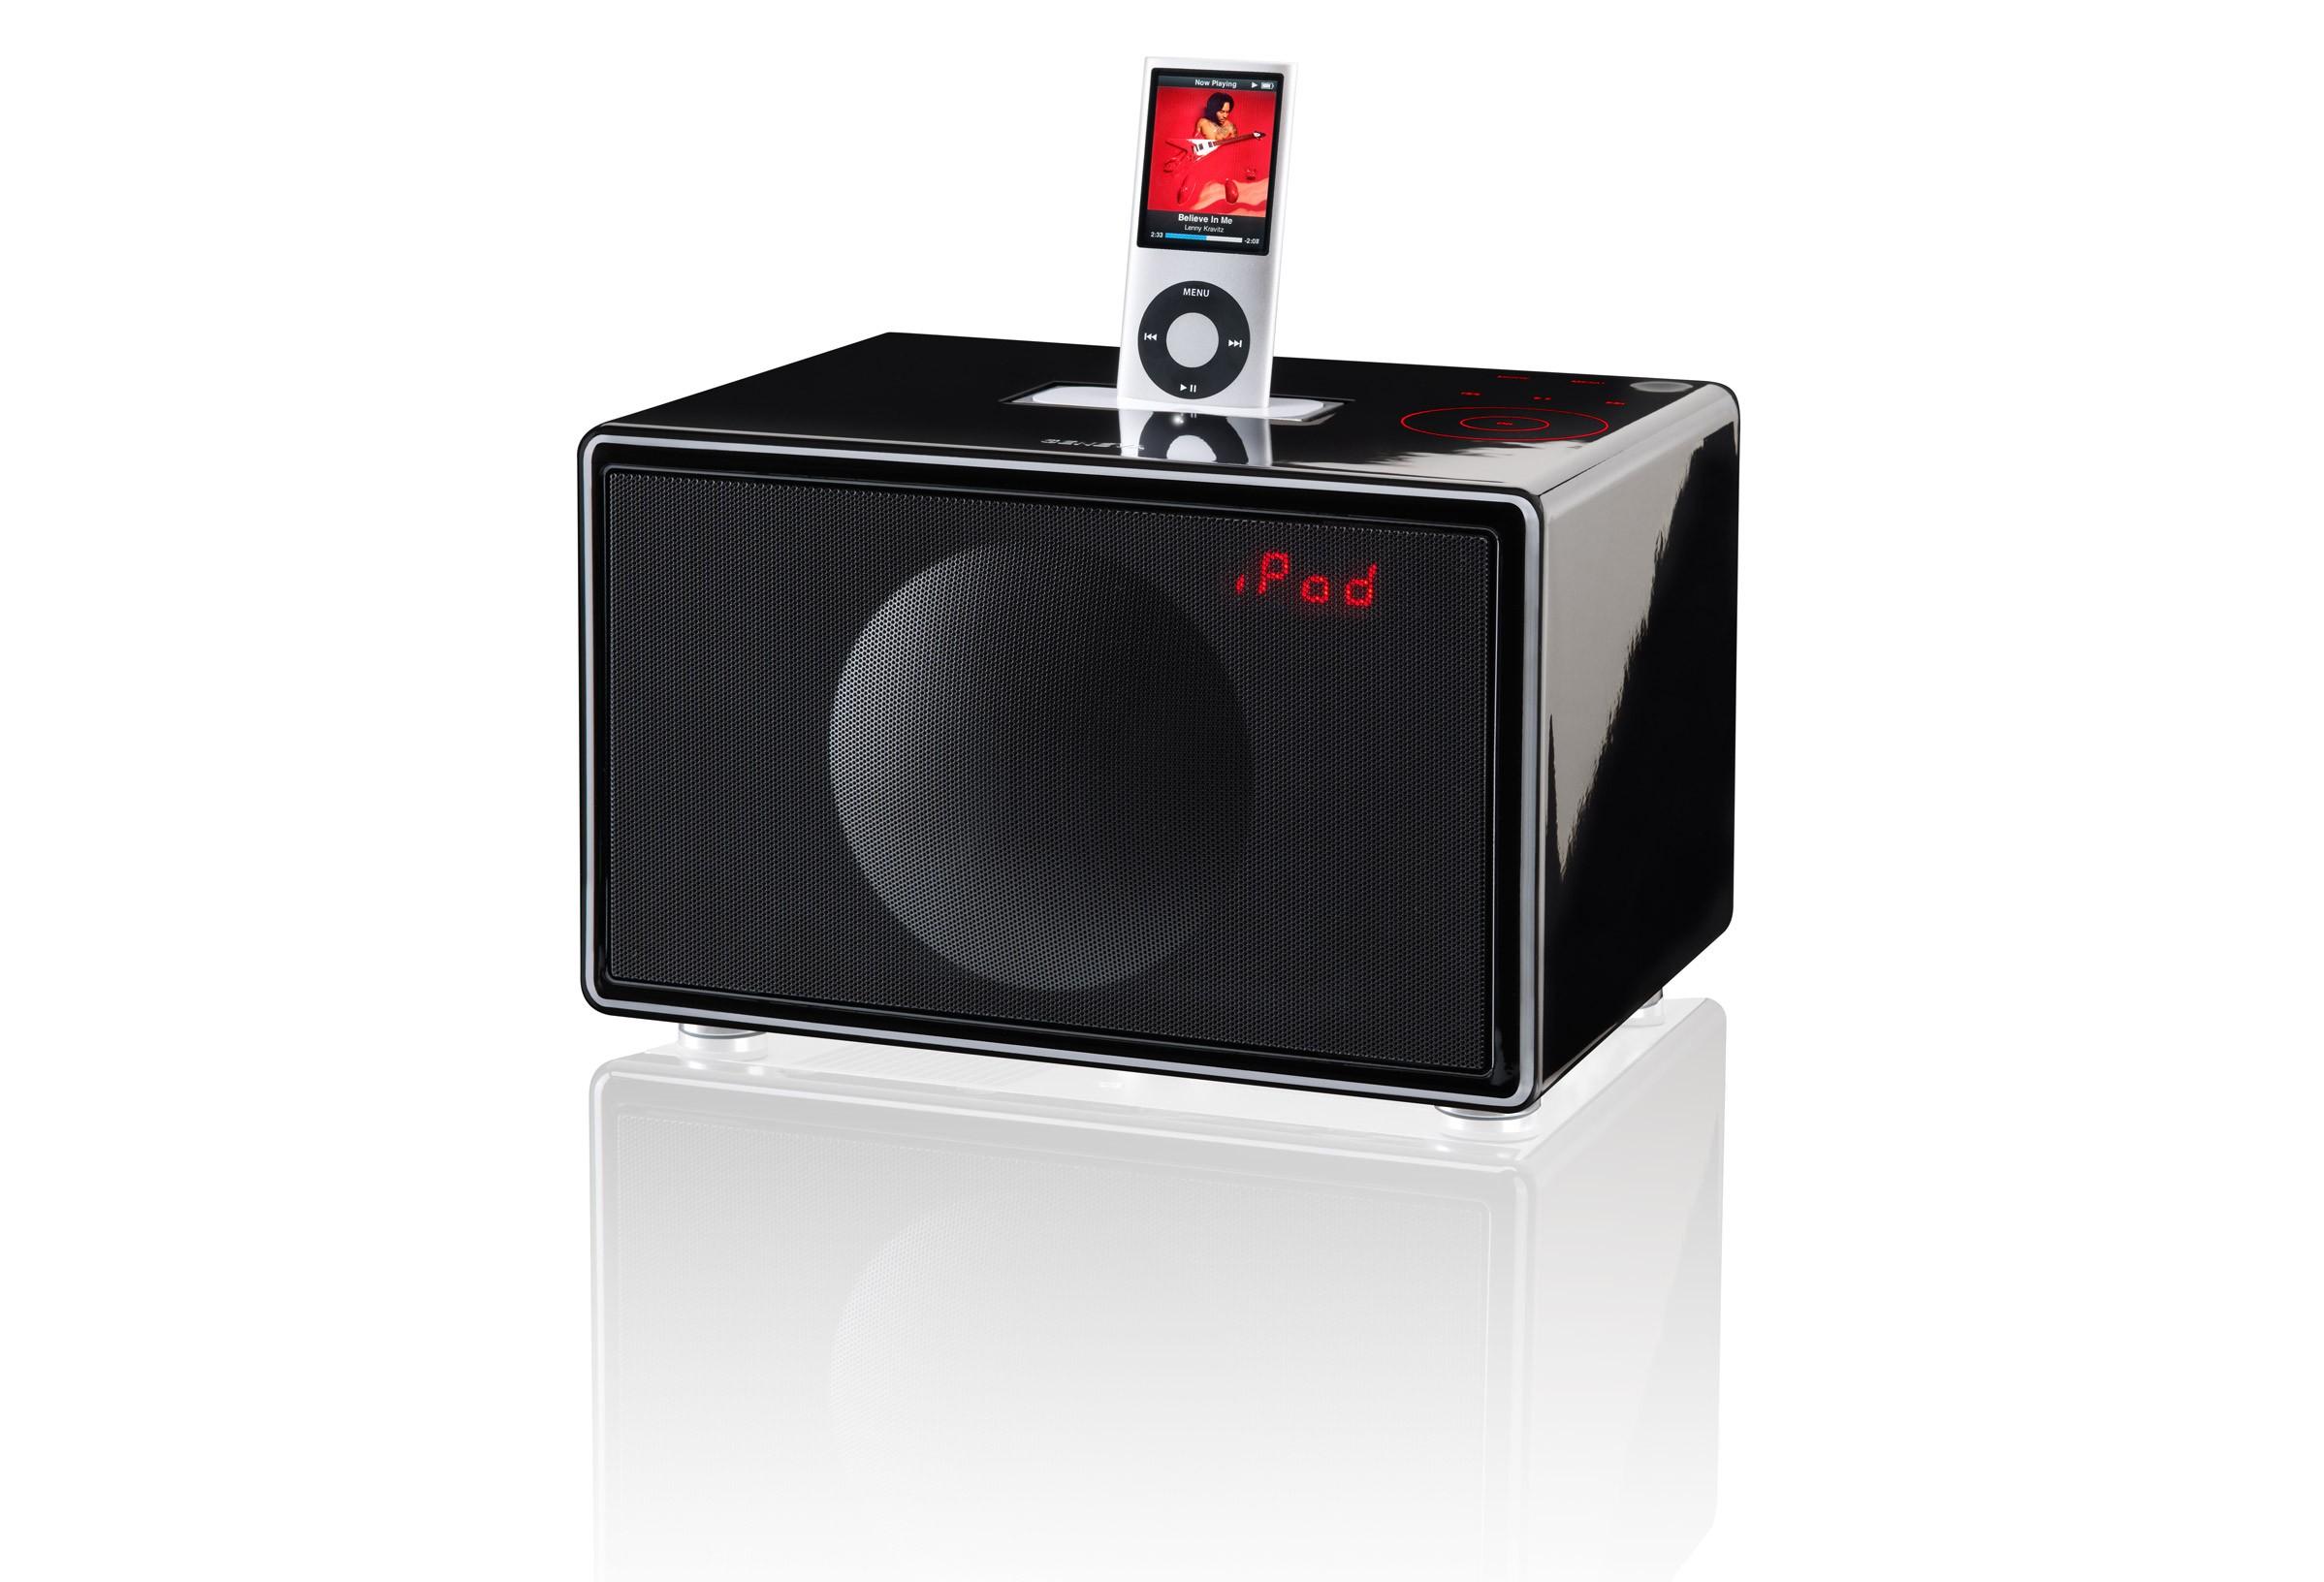 iPod iPhone speaker dock review, Tech Fogey, B&W, Arcam